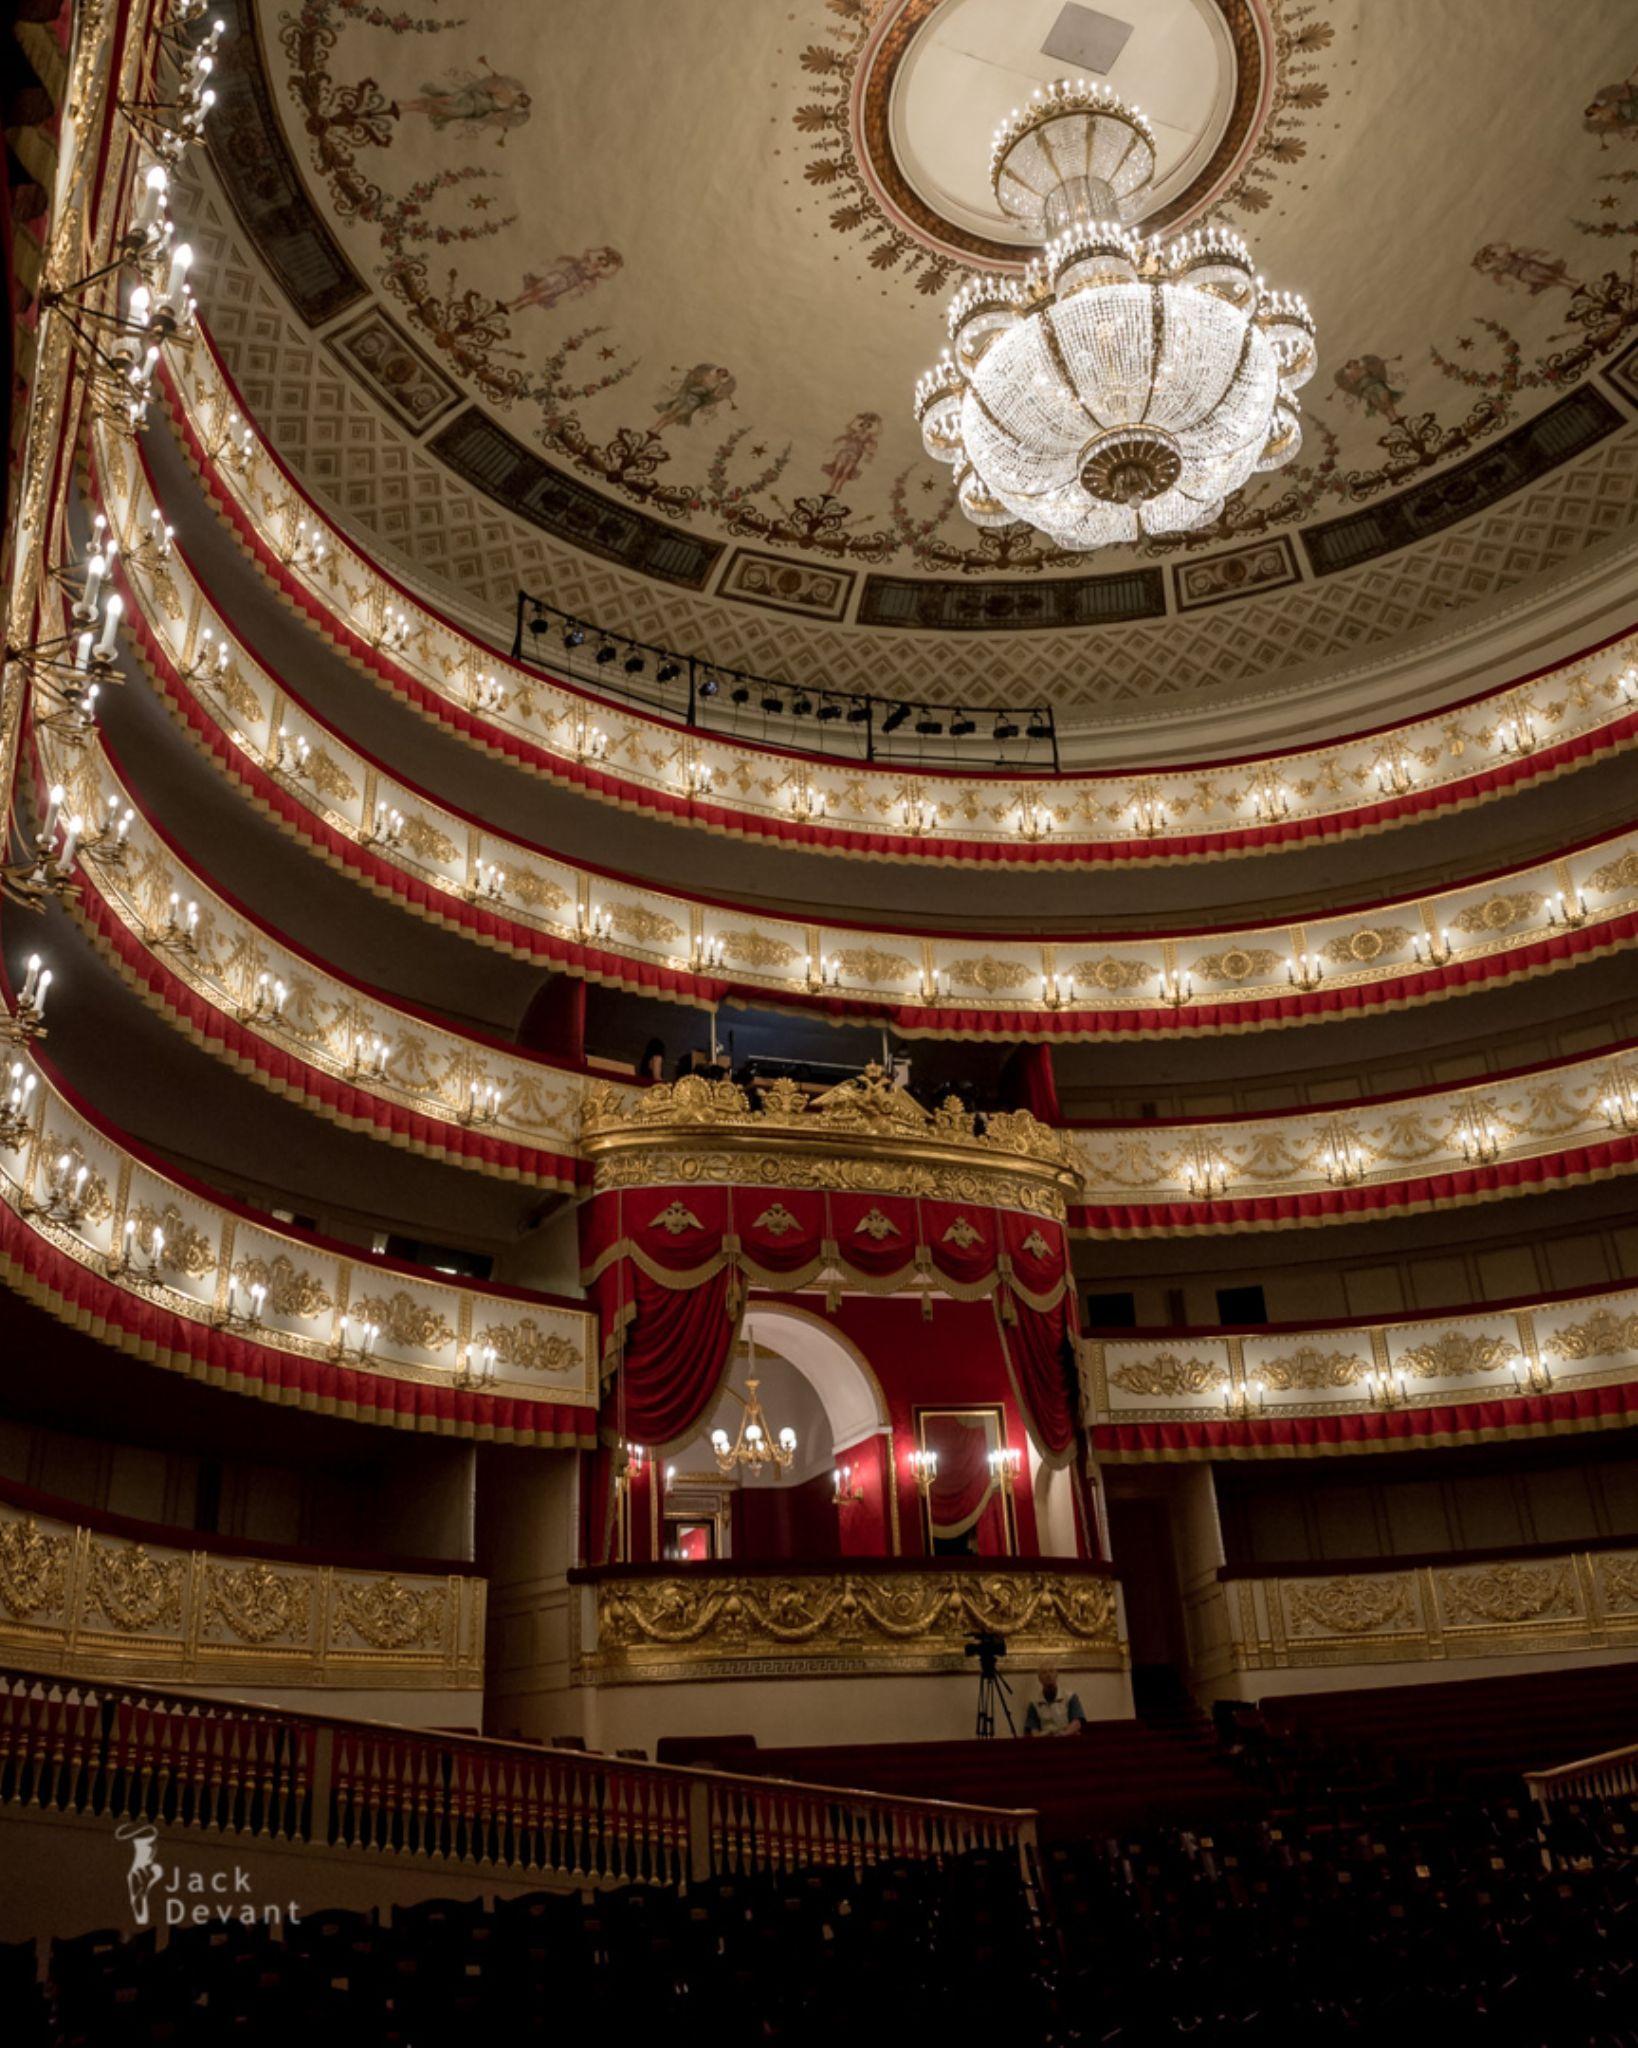 Alexandrinsky Theatre by Jack Devant